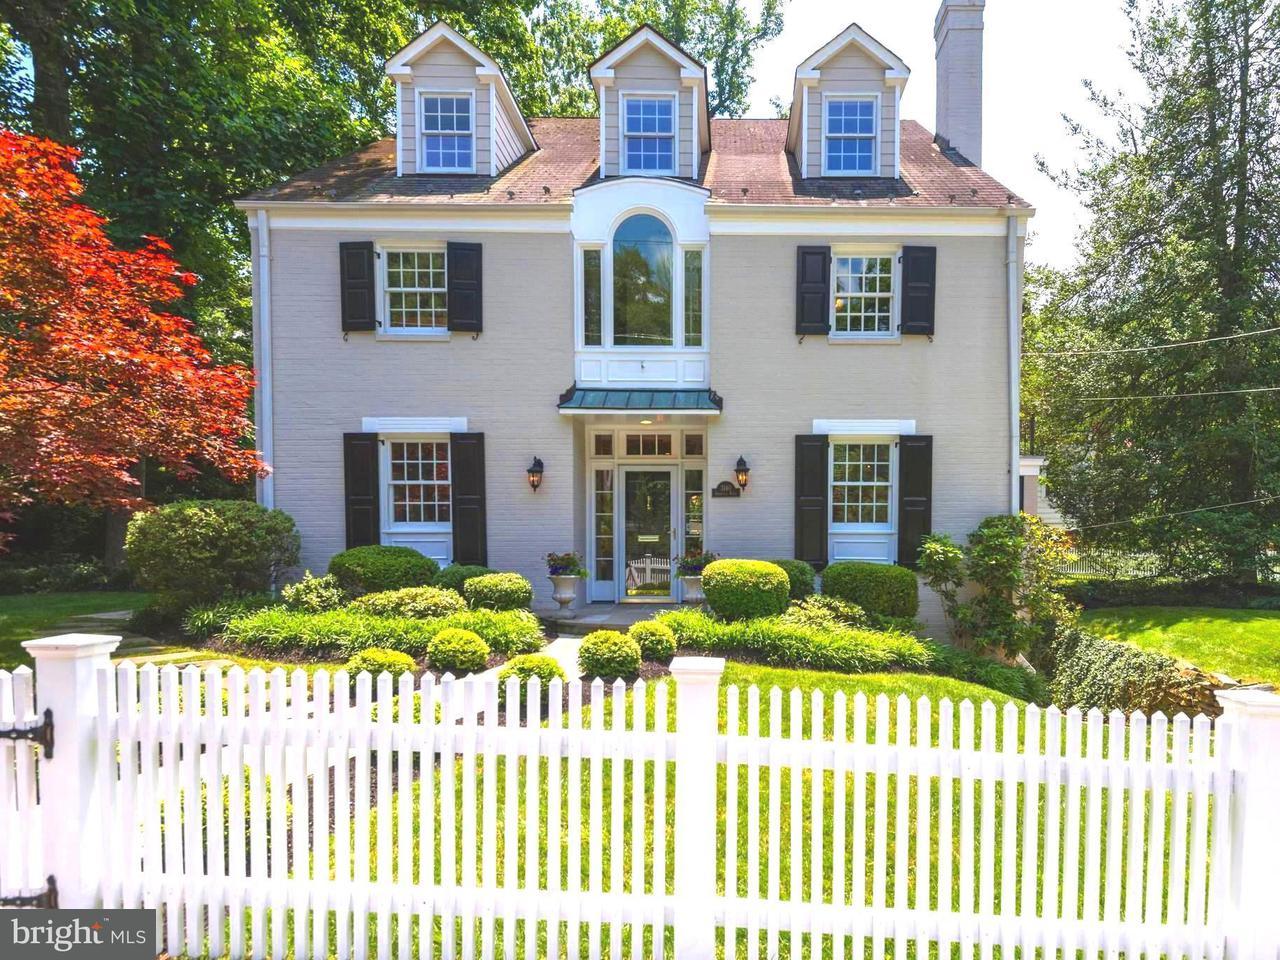 Single Family Home for Sale at 3140 Aberfoyle Pl Nw 3140 Aberfoyle Pl Nw Washington, District Of Columbia 20015 United States